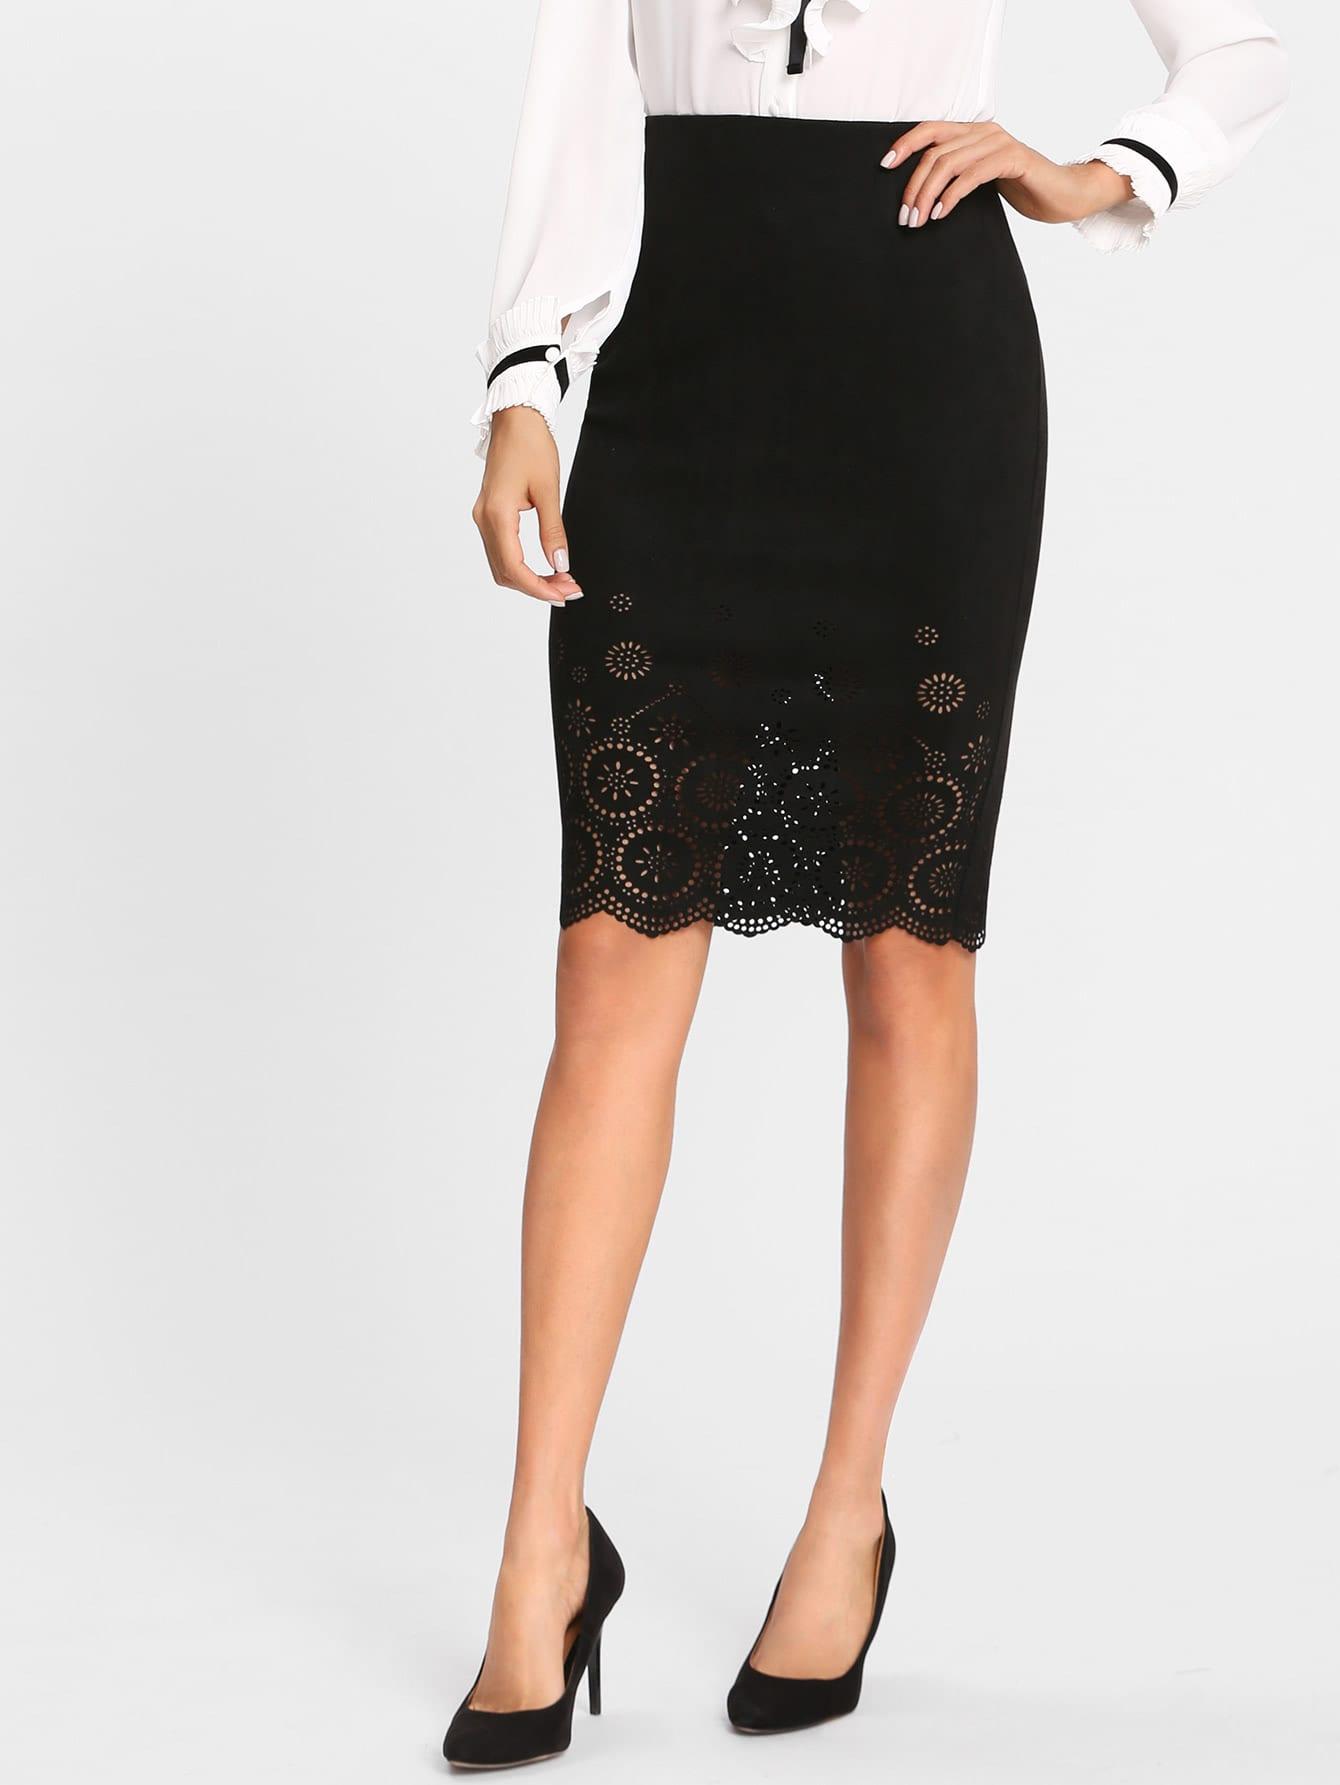 Scallop Laser Cut Vented Skirt scallop laser cut form fitting dress